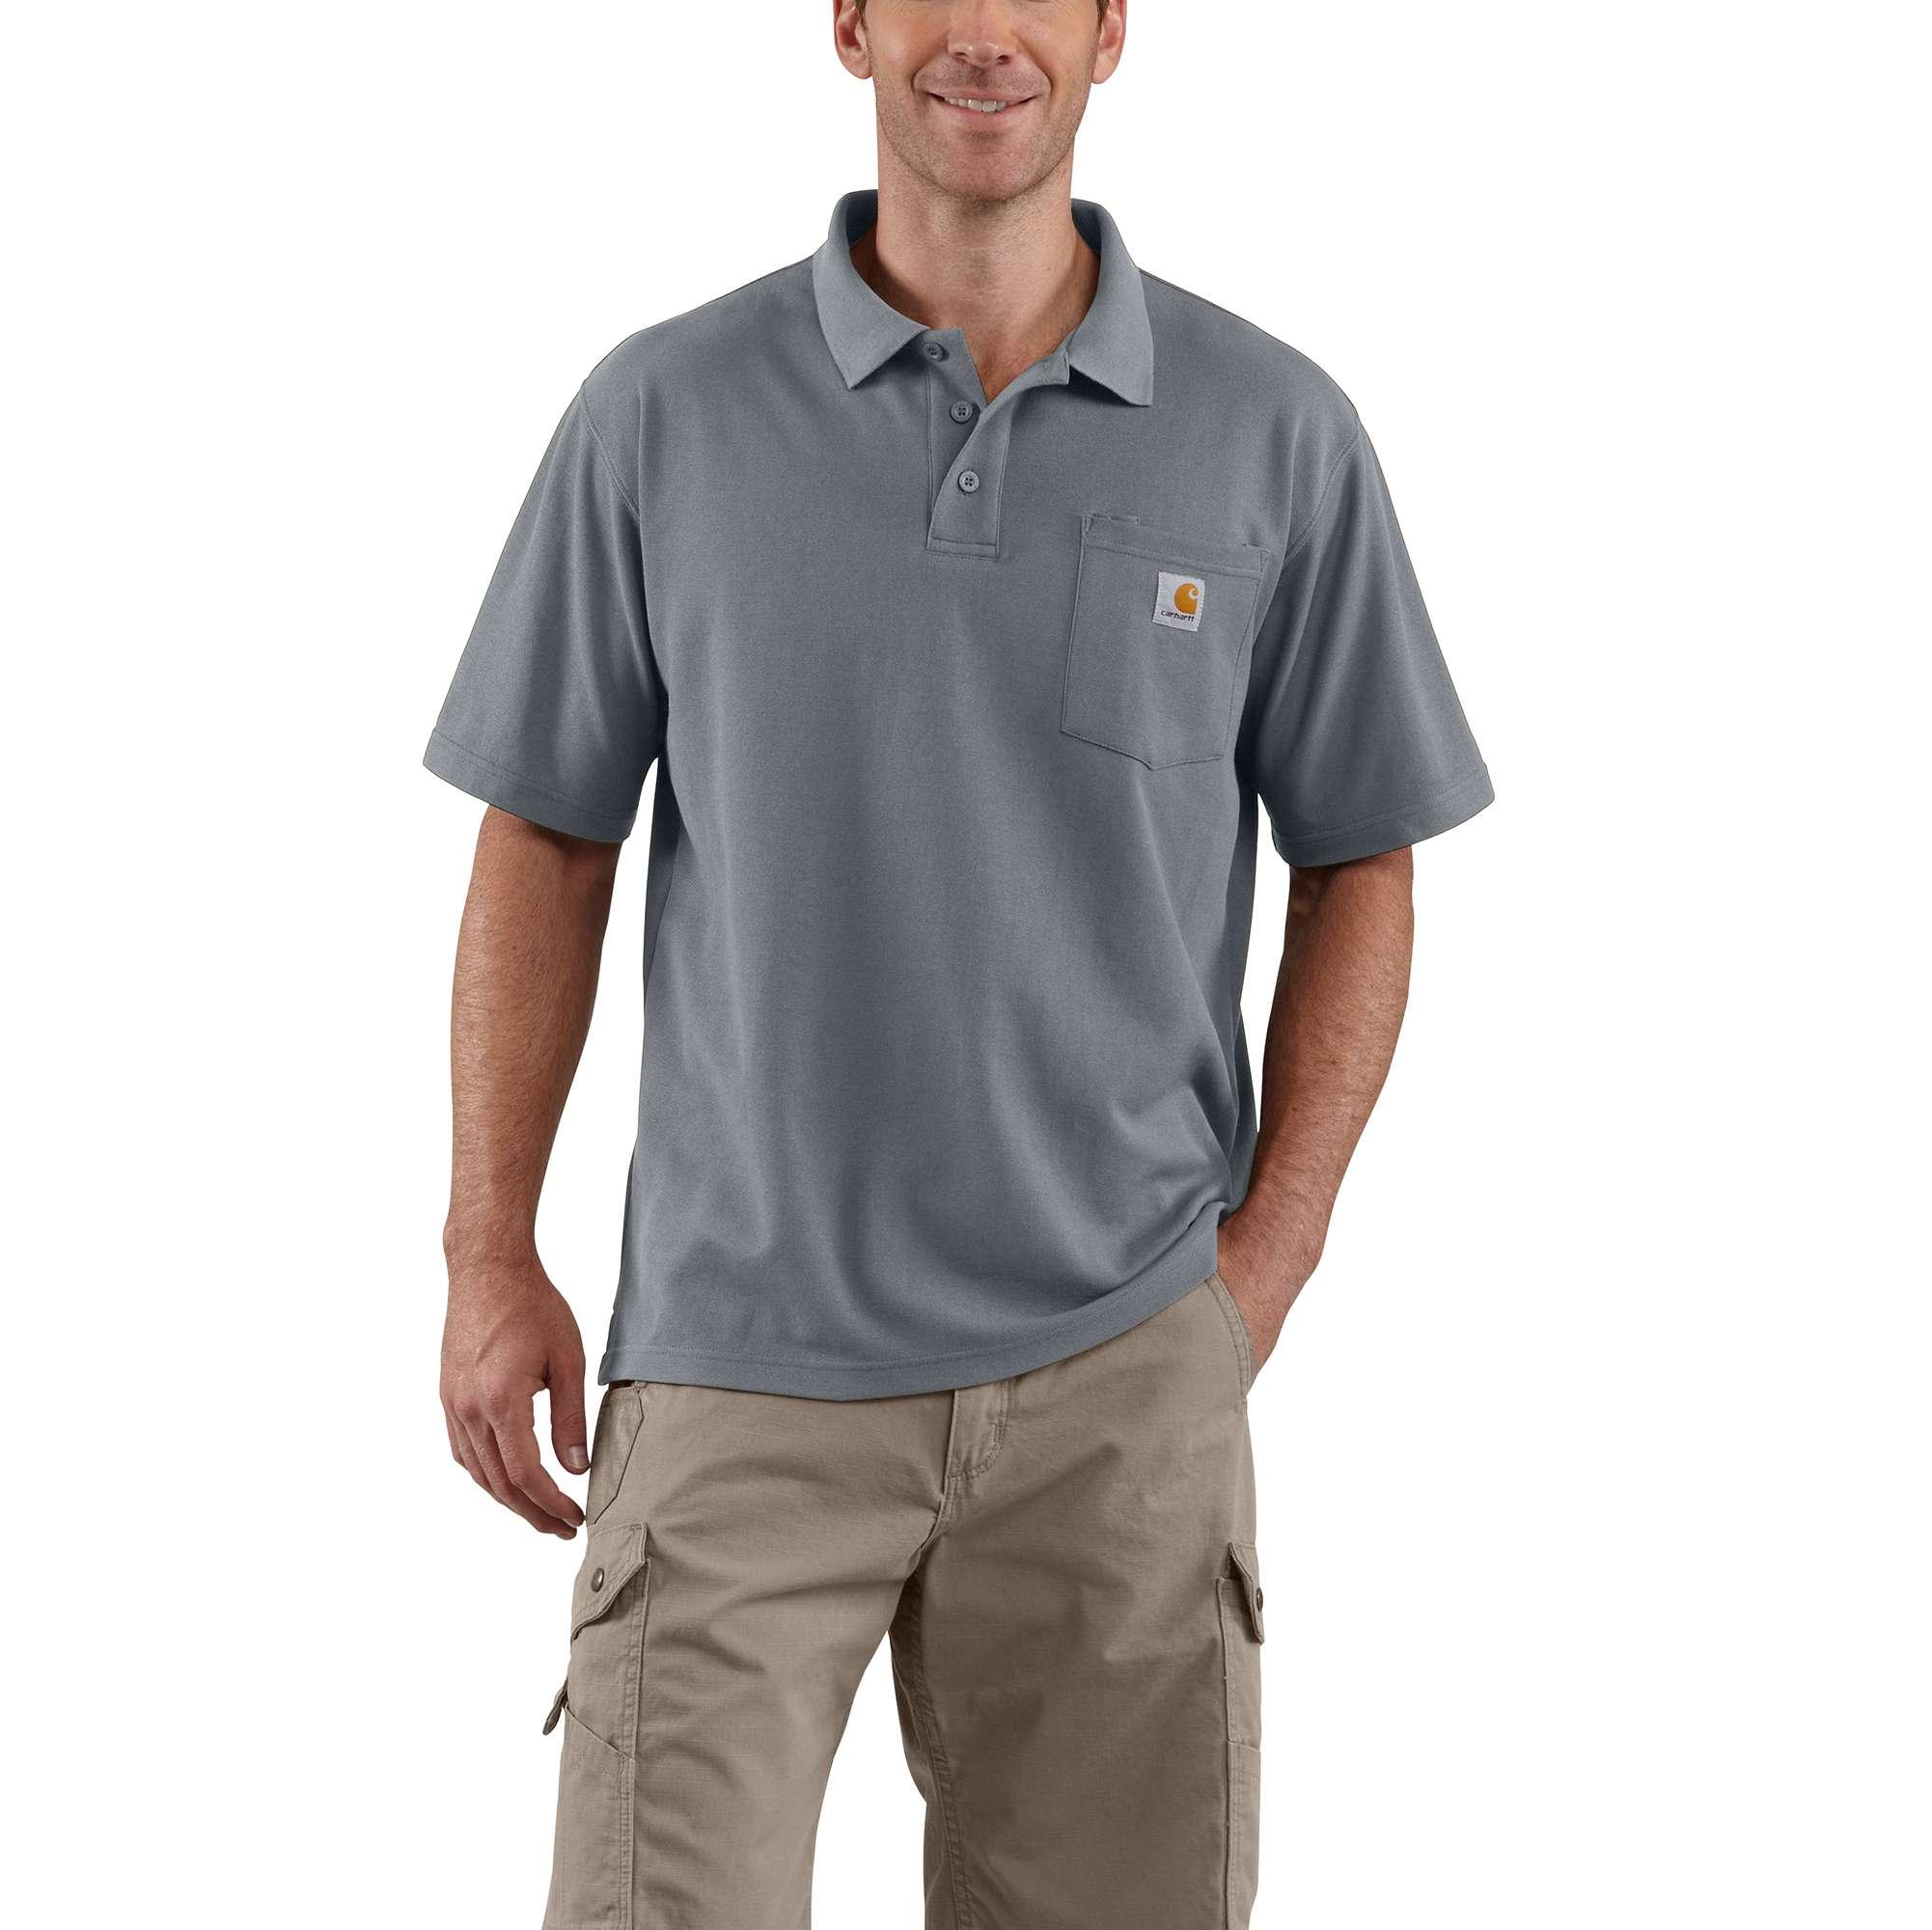 Carhartt Contractor's Work Pocket Polo